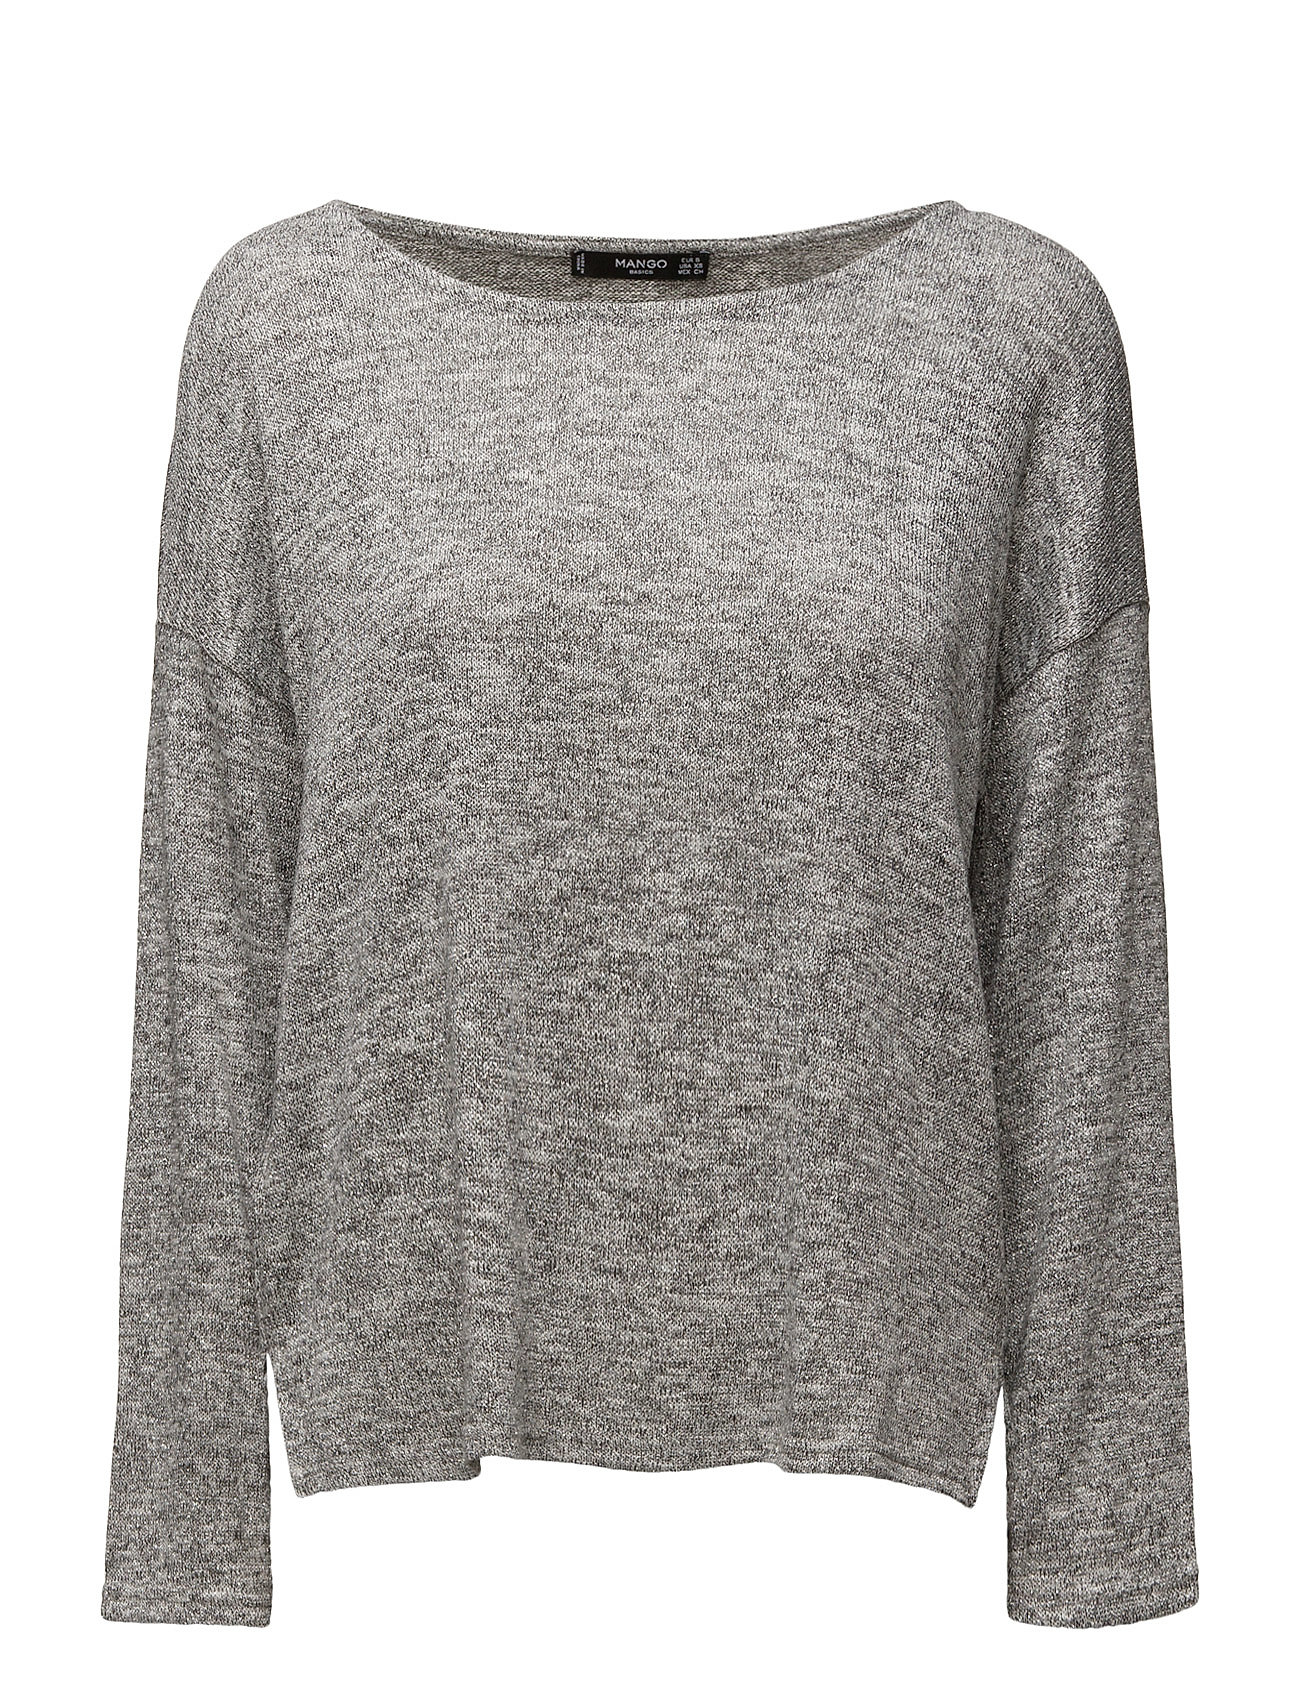 Metallic Thread T-Shirt Mango Striktøj til Kvinder i Lt Pastel Grey